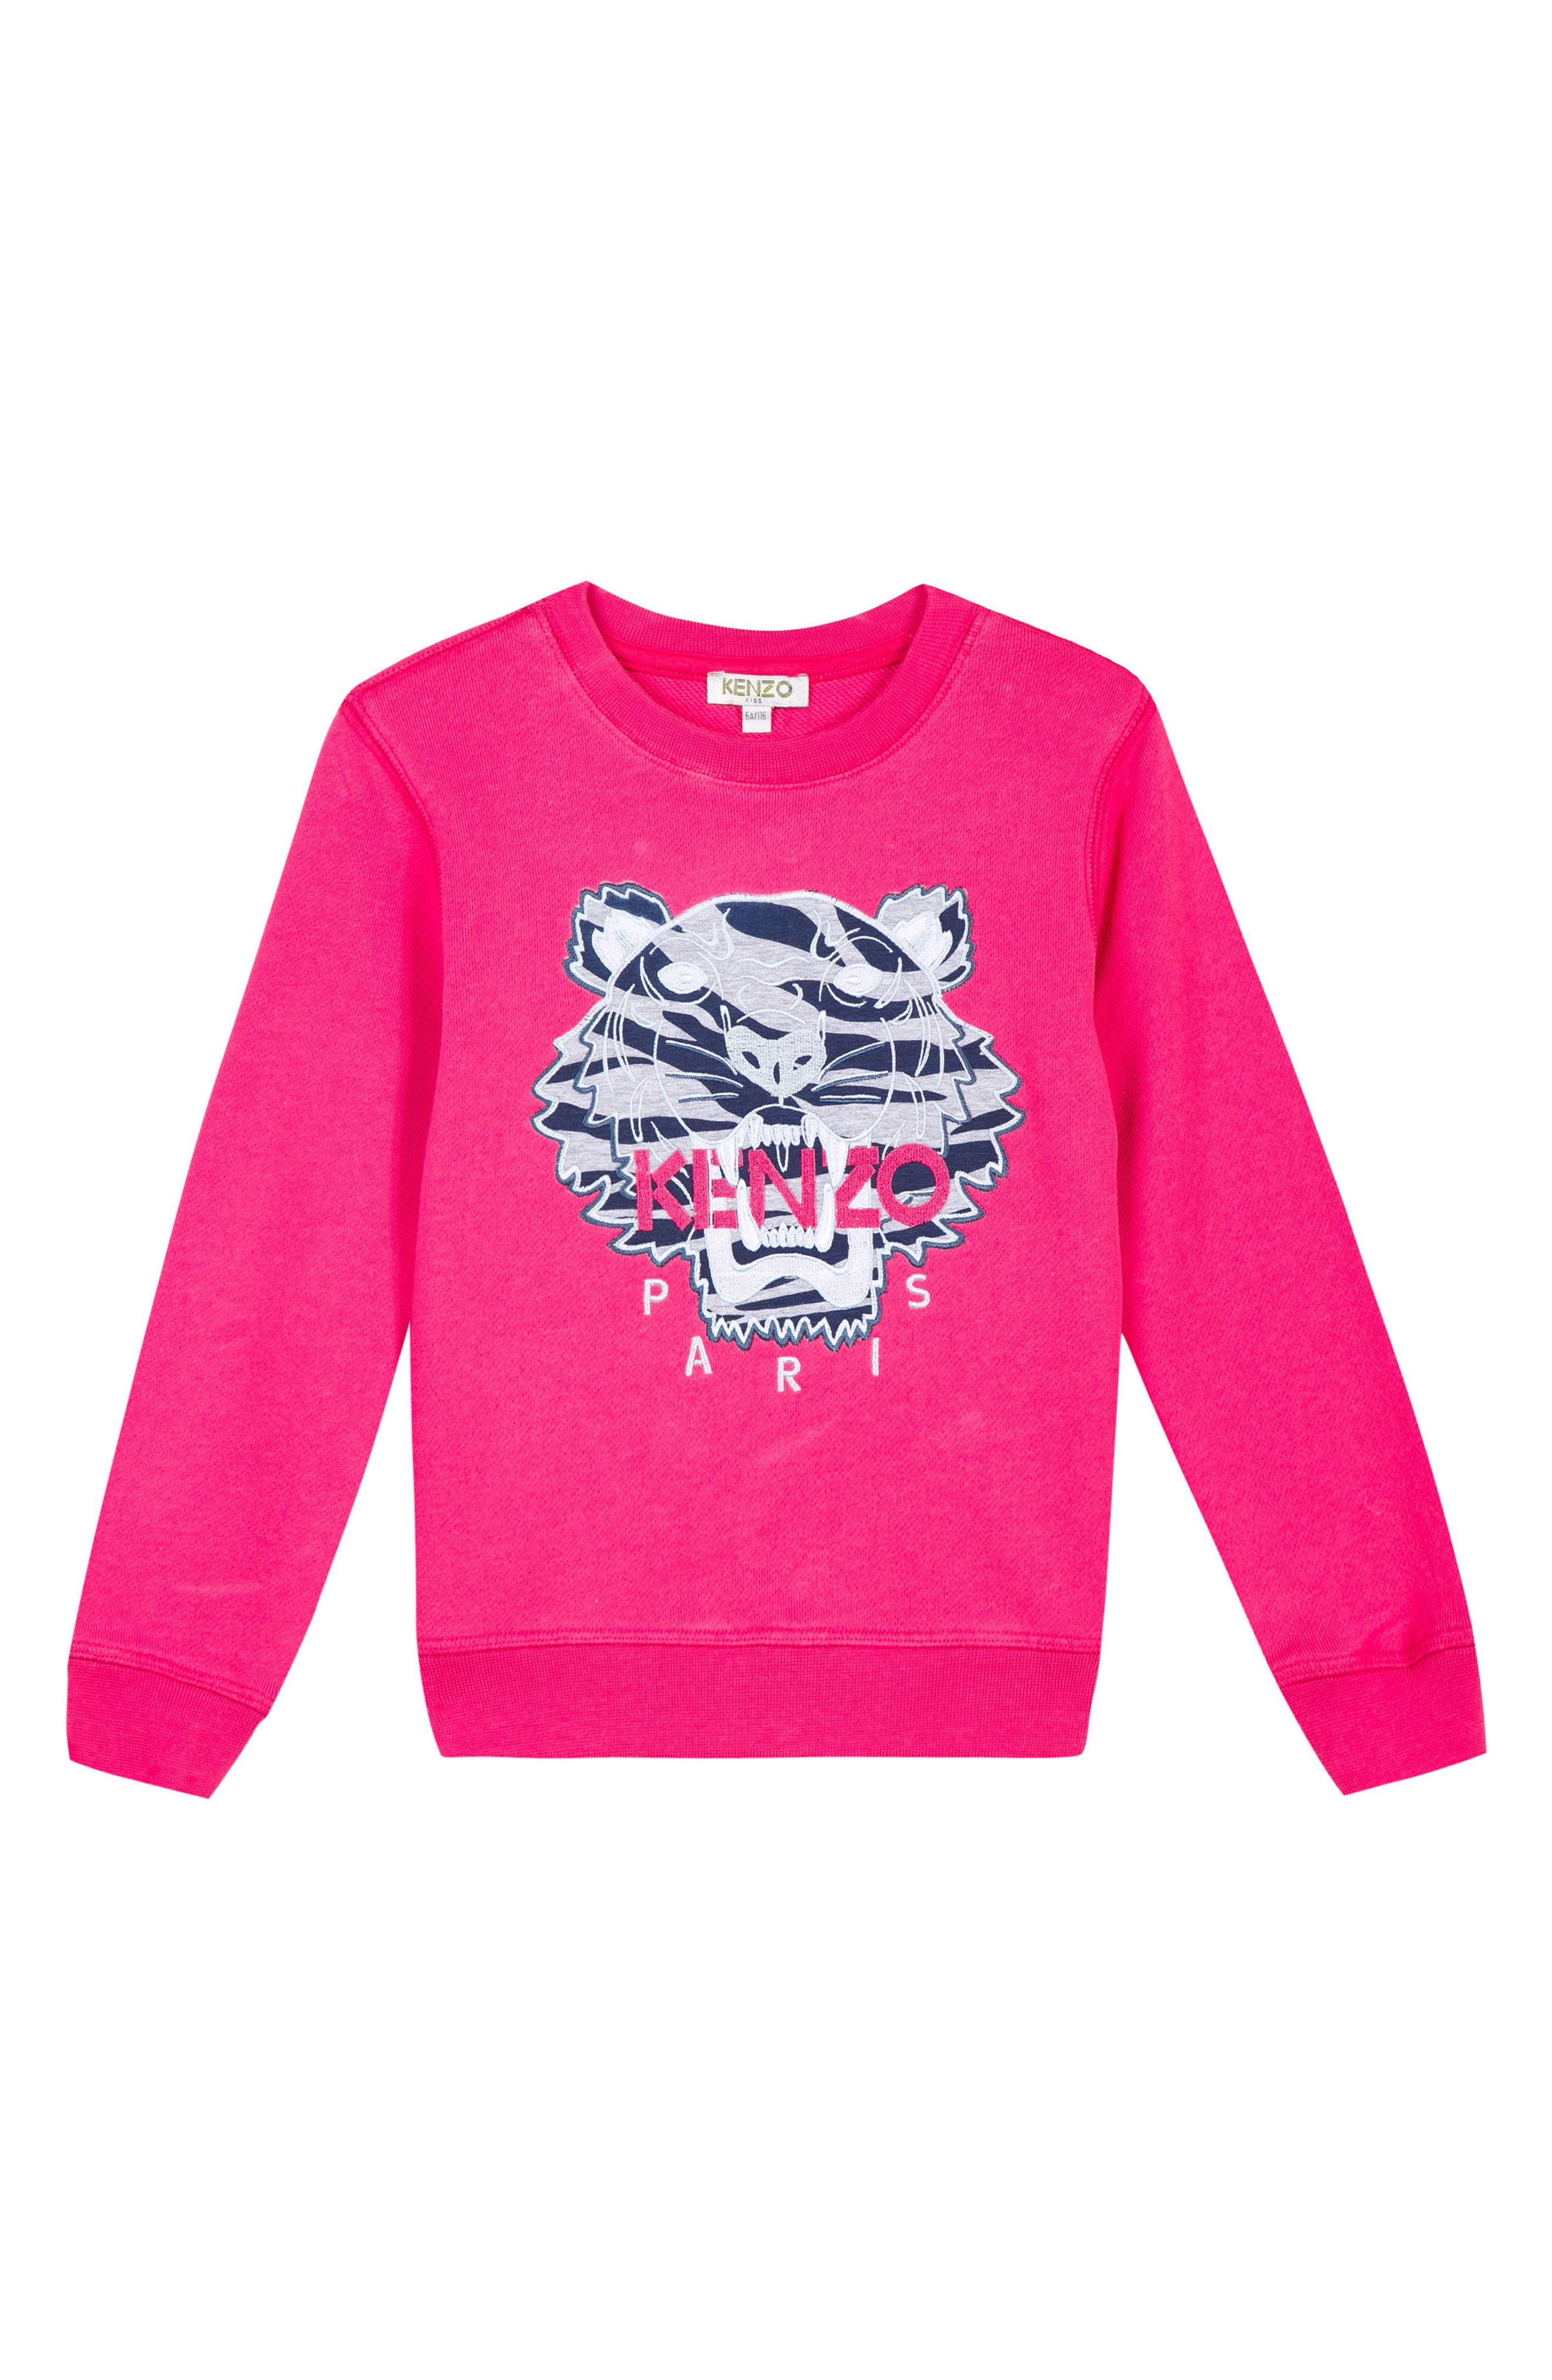 Alternate Image 1 Selected - KENZO Embroidered Tiger Logo Sweatshirt (Toddler Girls, Little Girls & Big Girls)